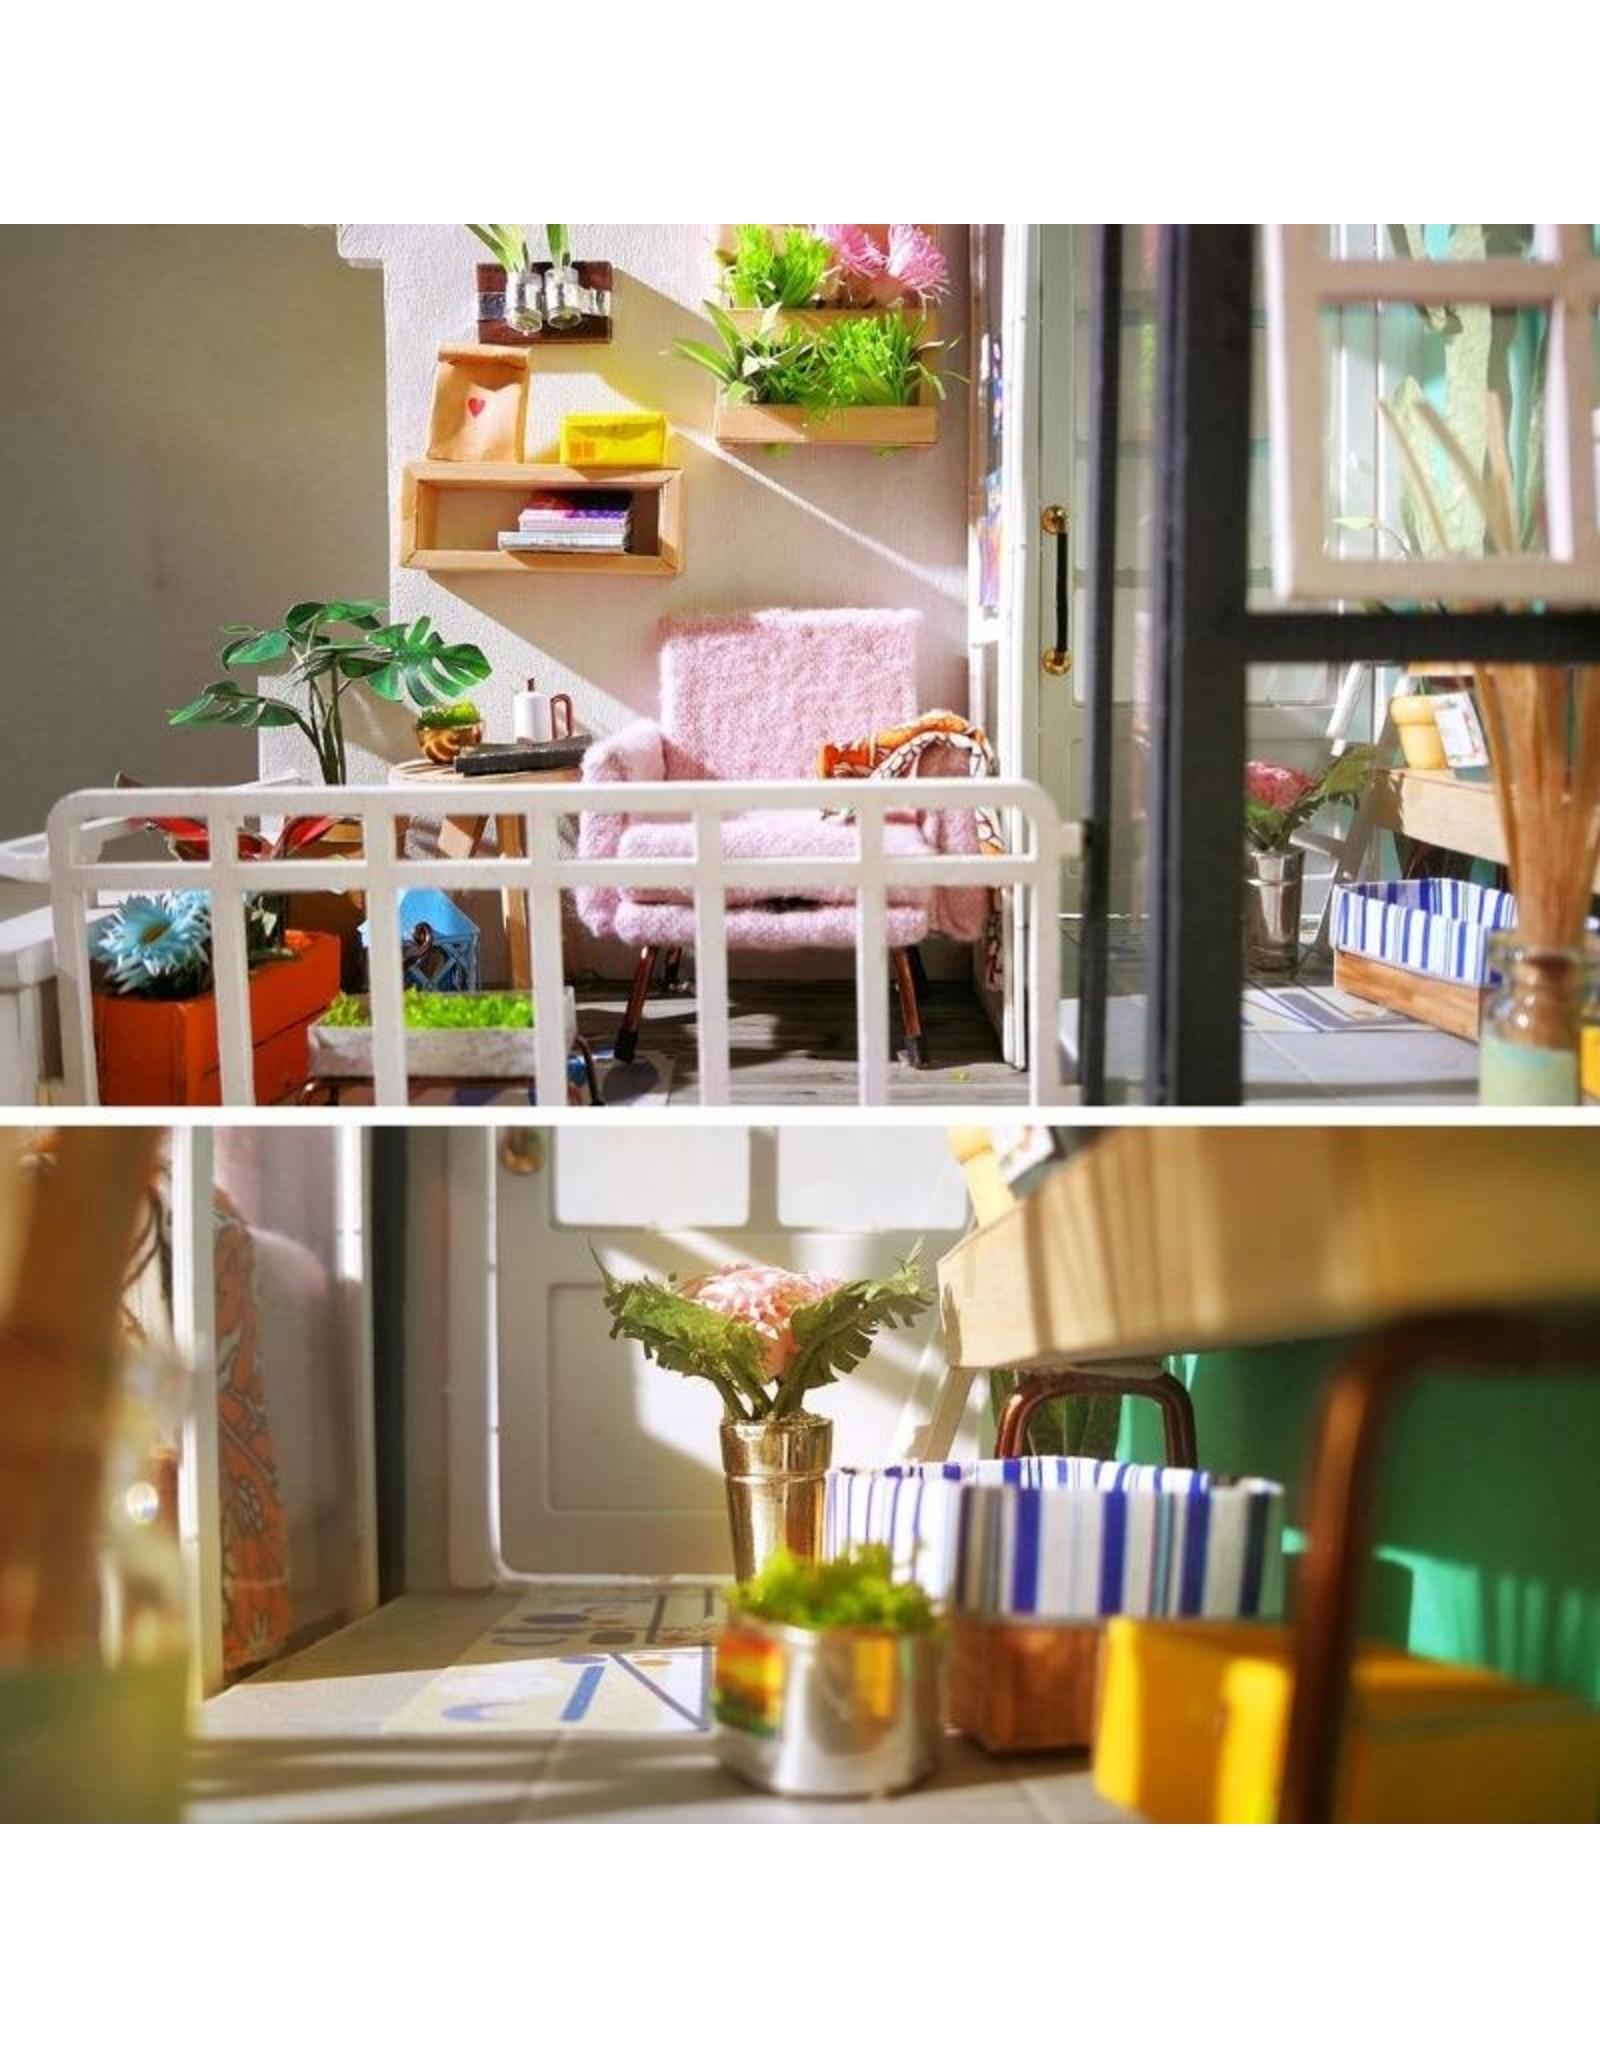 Rolife DIY House: Balcony Daydreaming